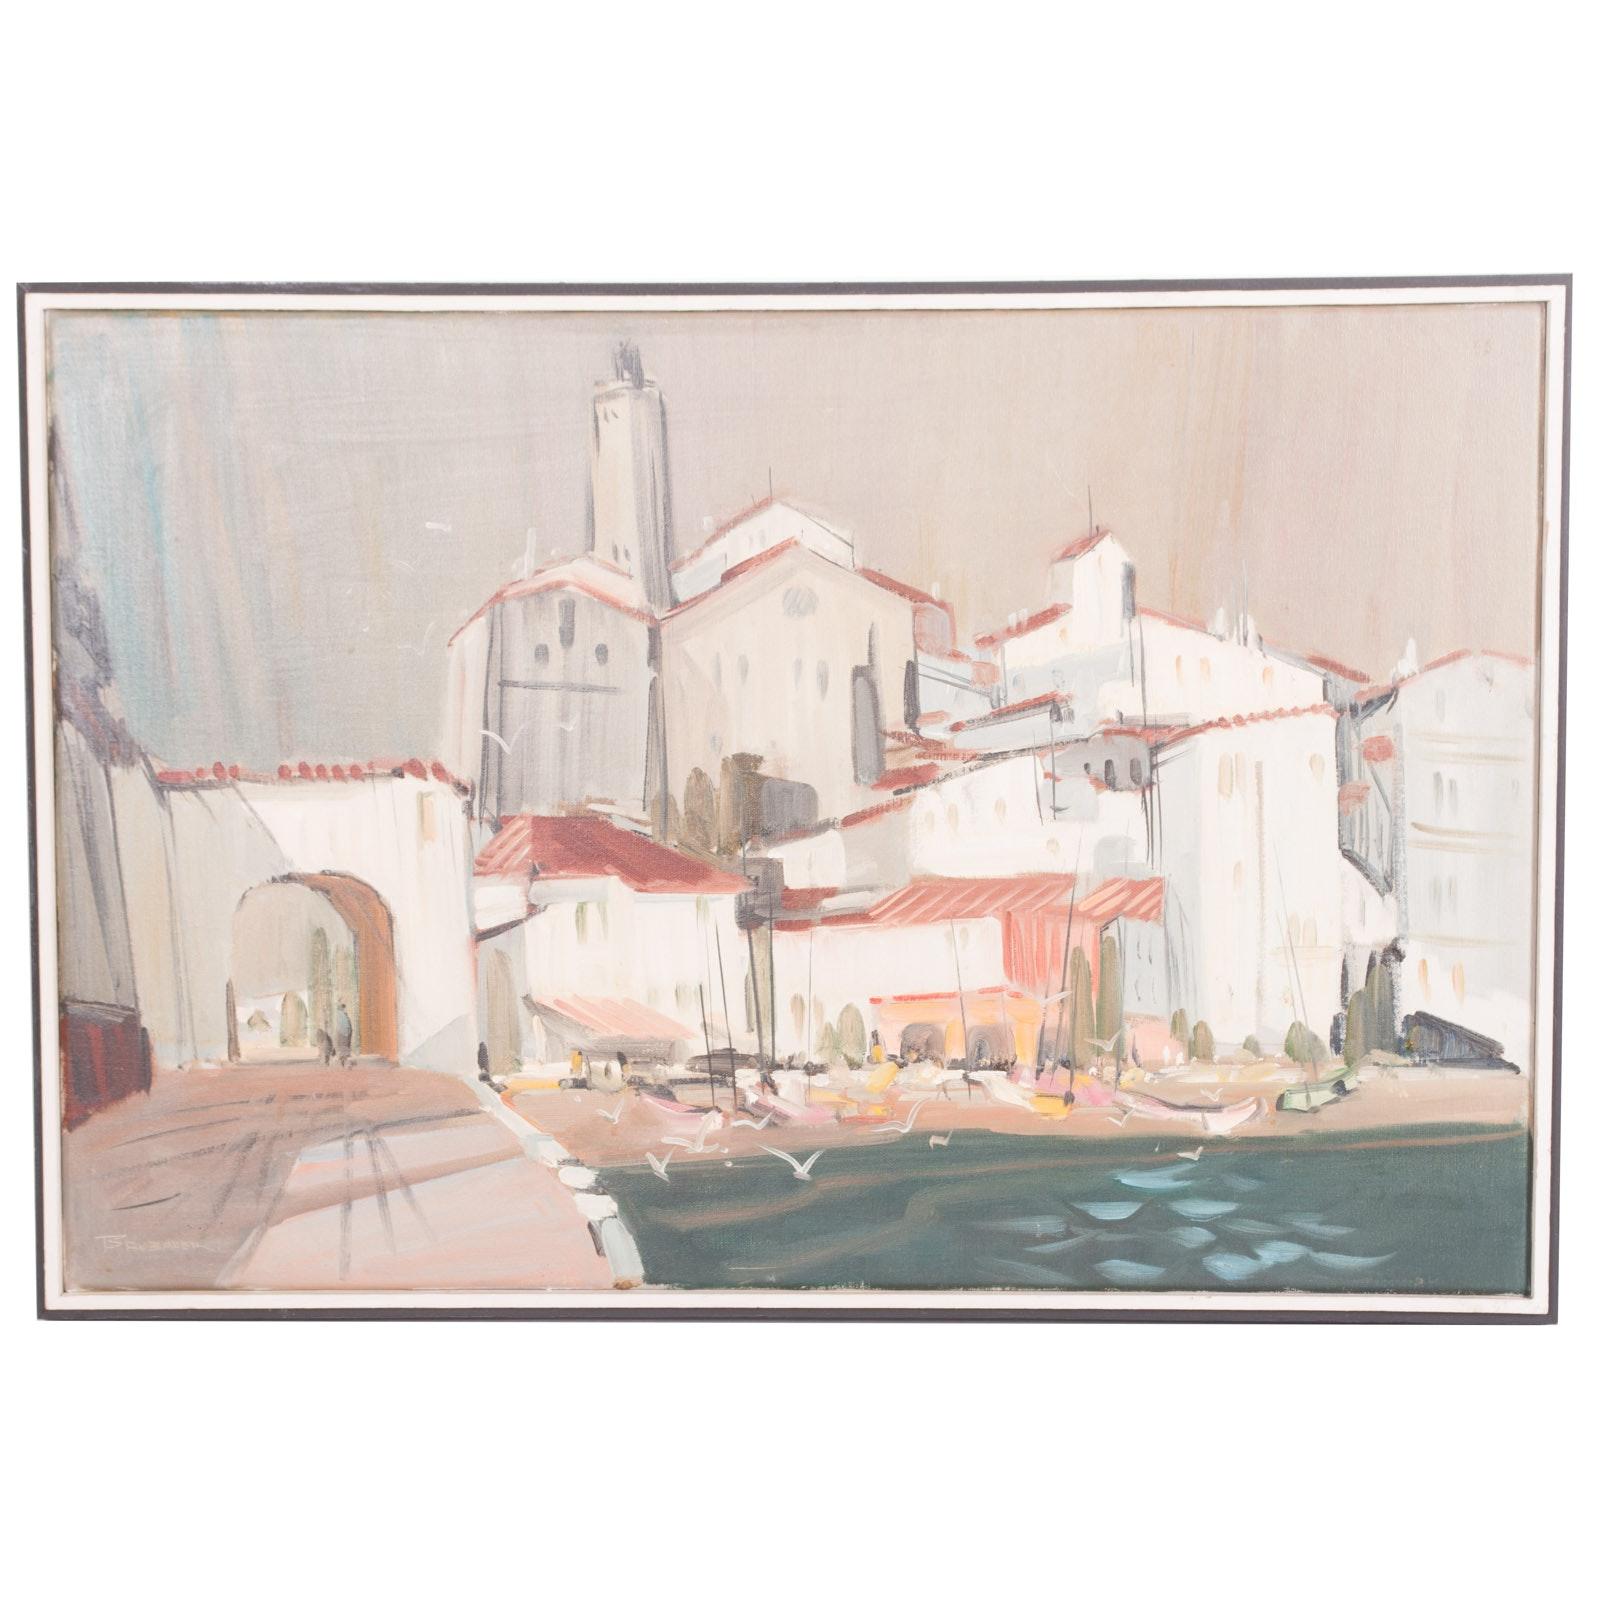 Robert Brubaker Original Oil Painting on Canvas of Coastal Village